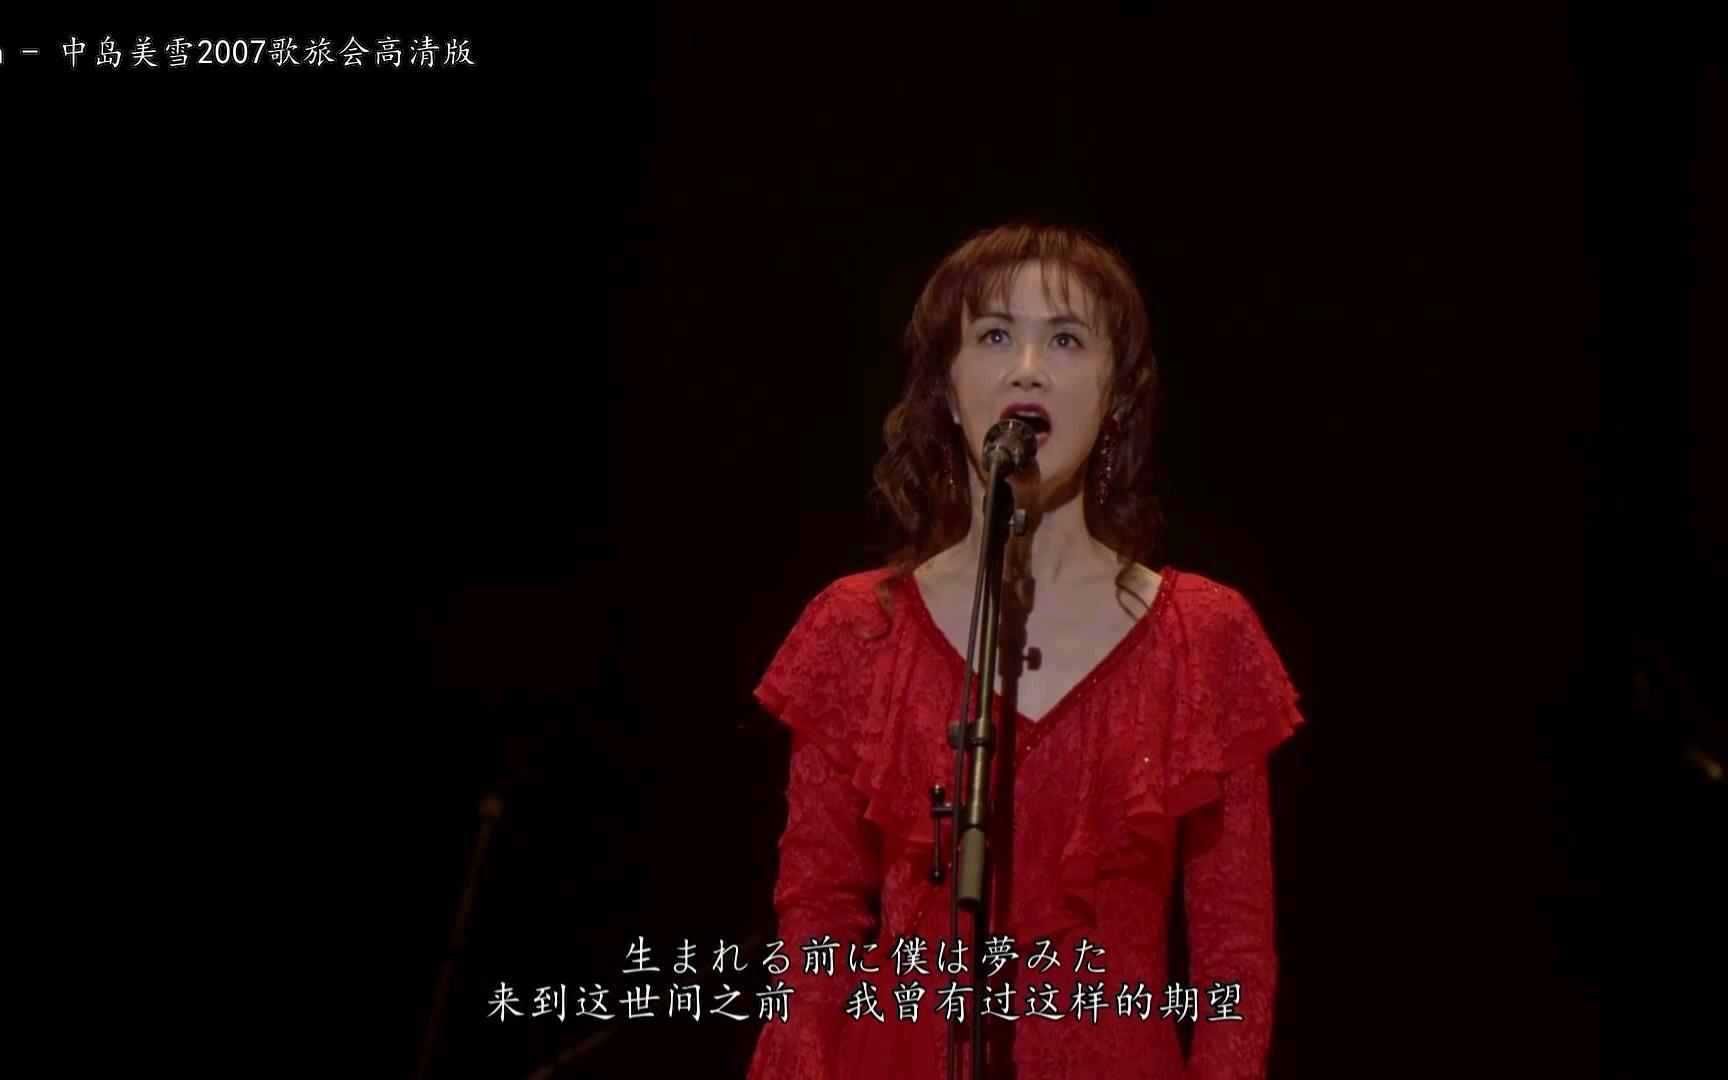 with - 中島美雪2007歌旅會高清版_嗶哩嗶哩 (゜-゜)つロ 干杯~-bilibili